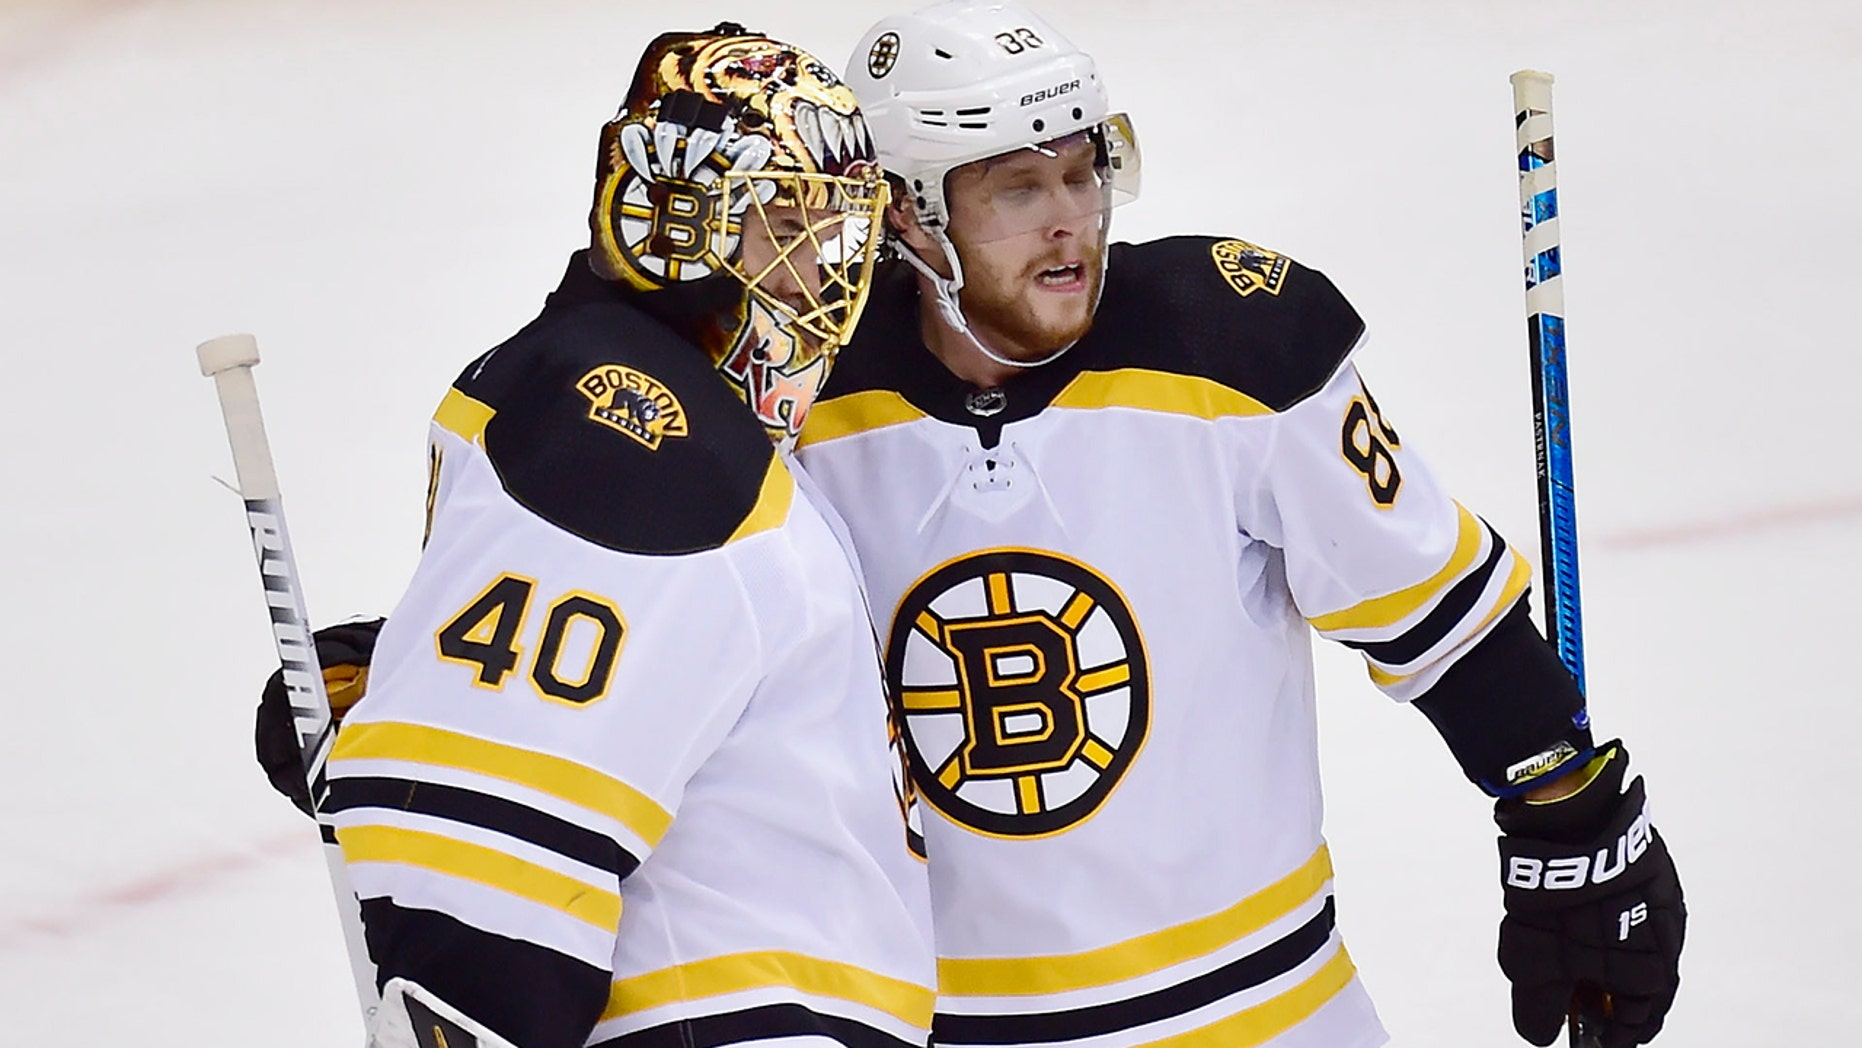 c0adc04ad50 Boston Bruins goaltender Tuukka Rask (40) and teammate David Pastrnak (88)  celebrate